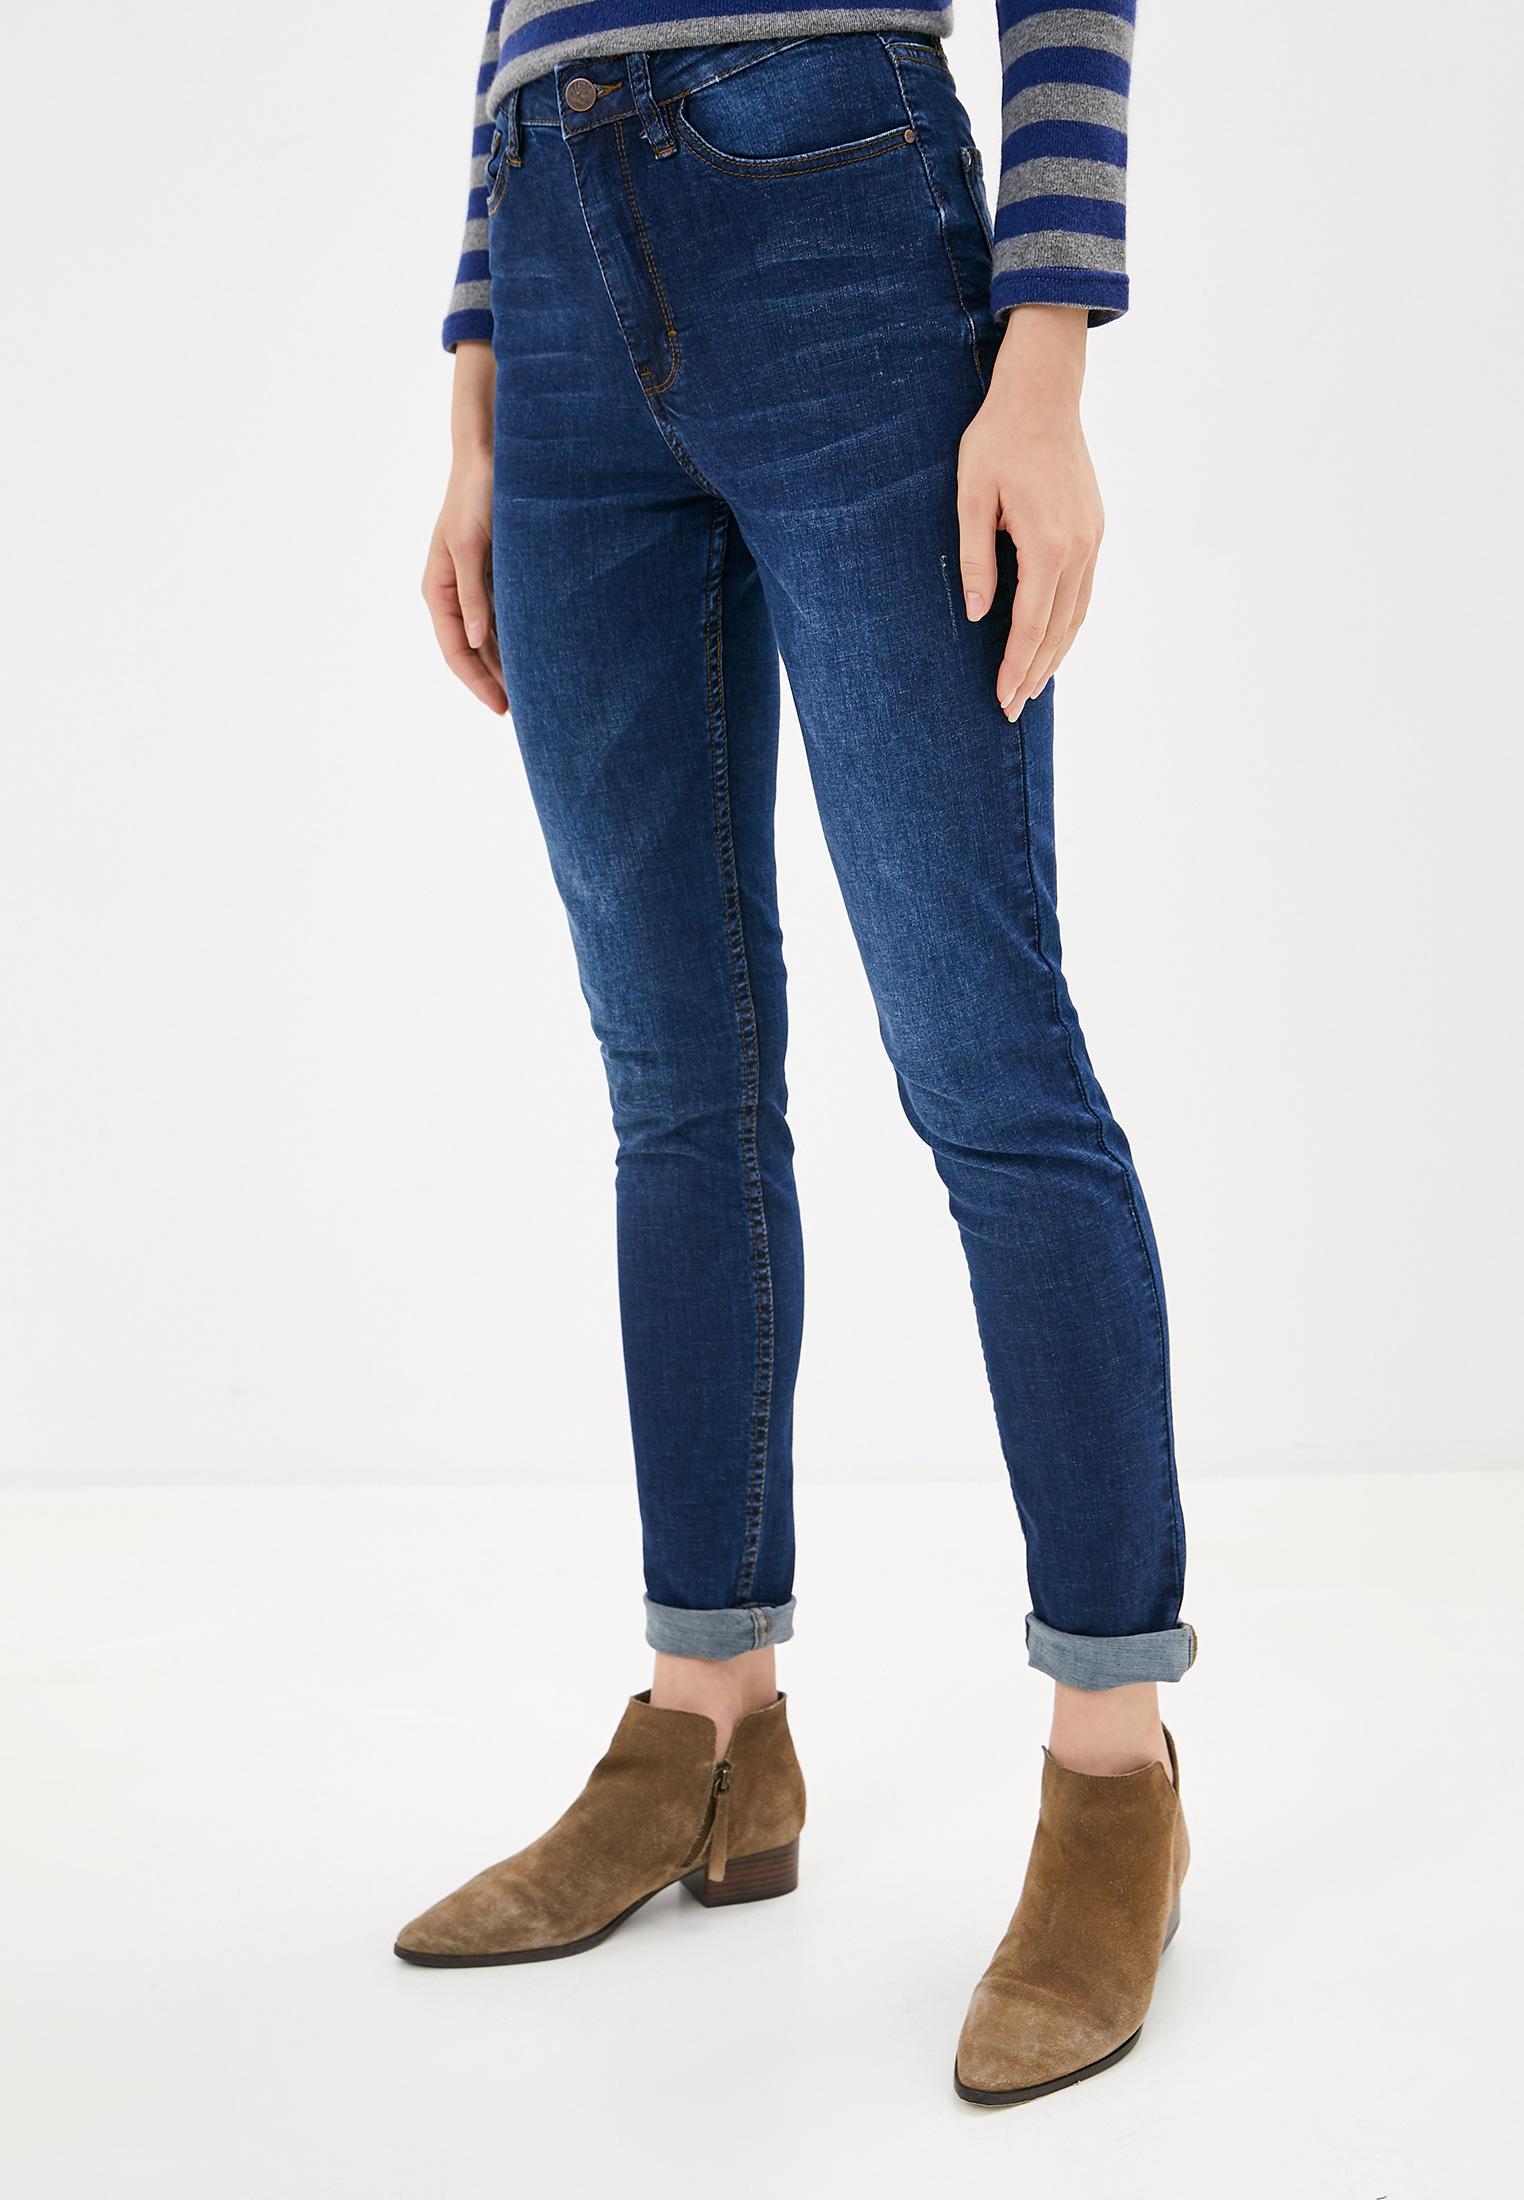 Зауженные джинсы Sela (Сэла) PJ-135/696-9391